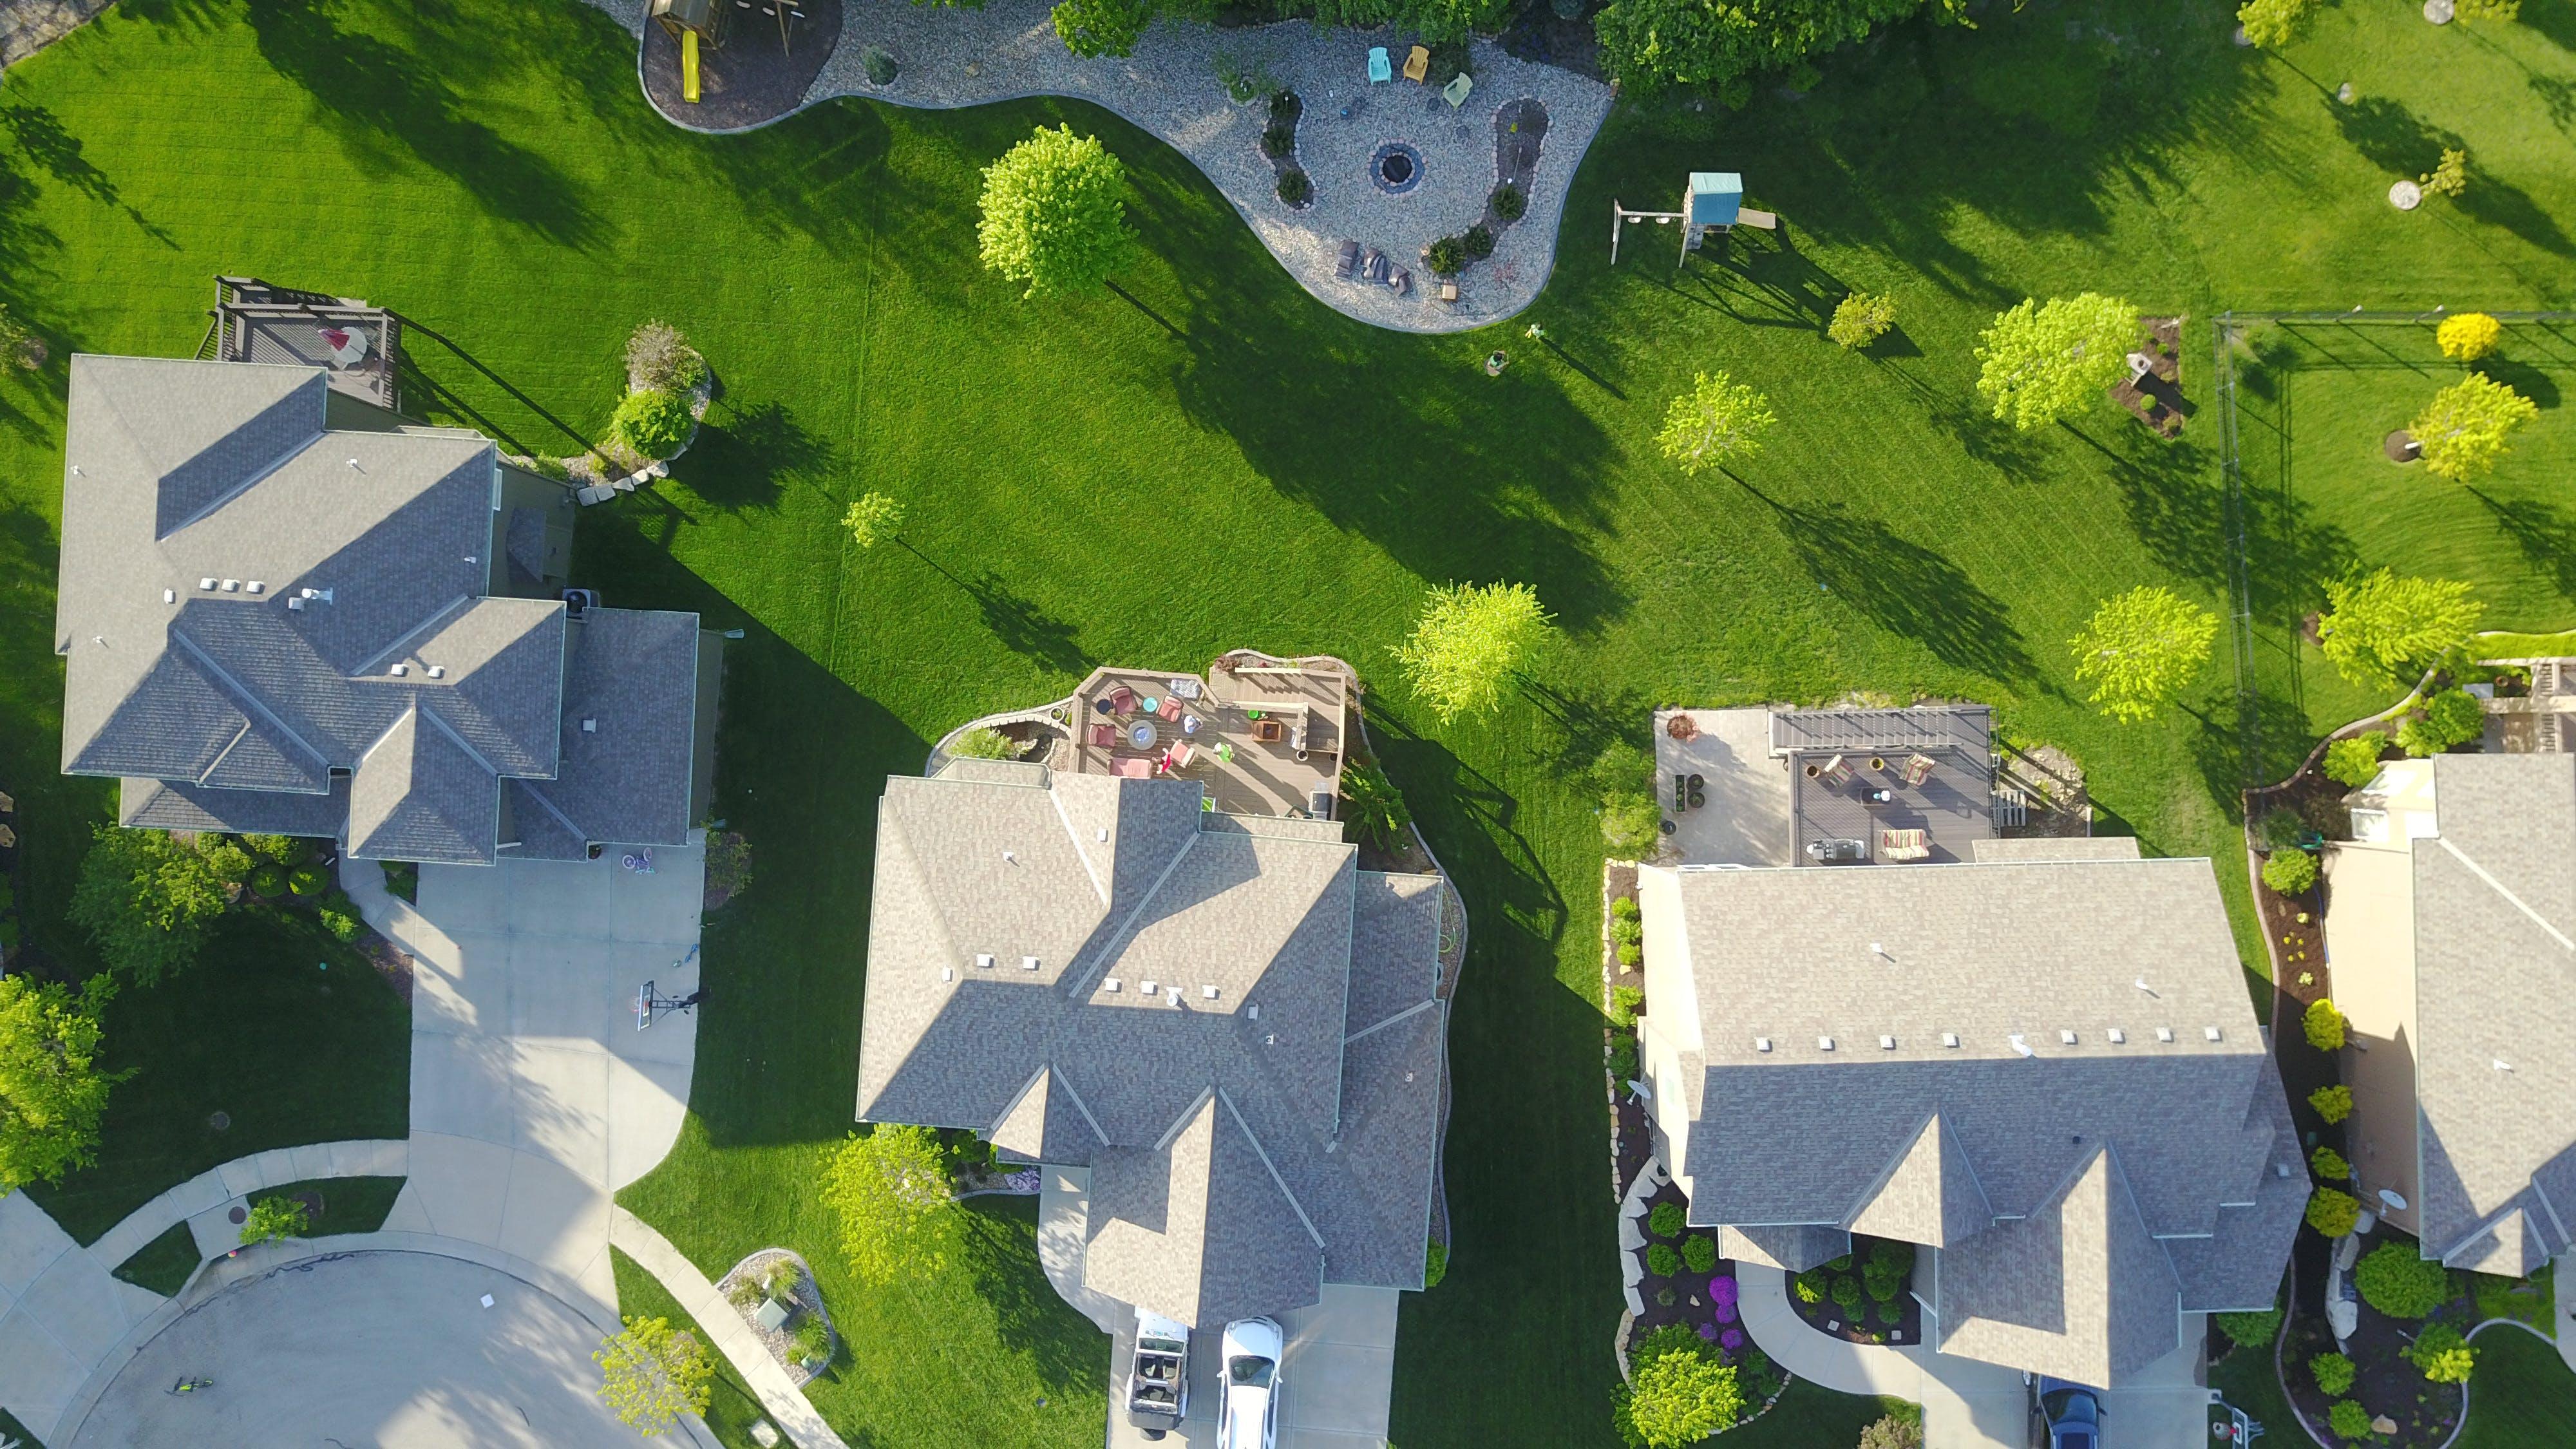 Free stock photo of neighborhood, aerial shot